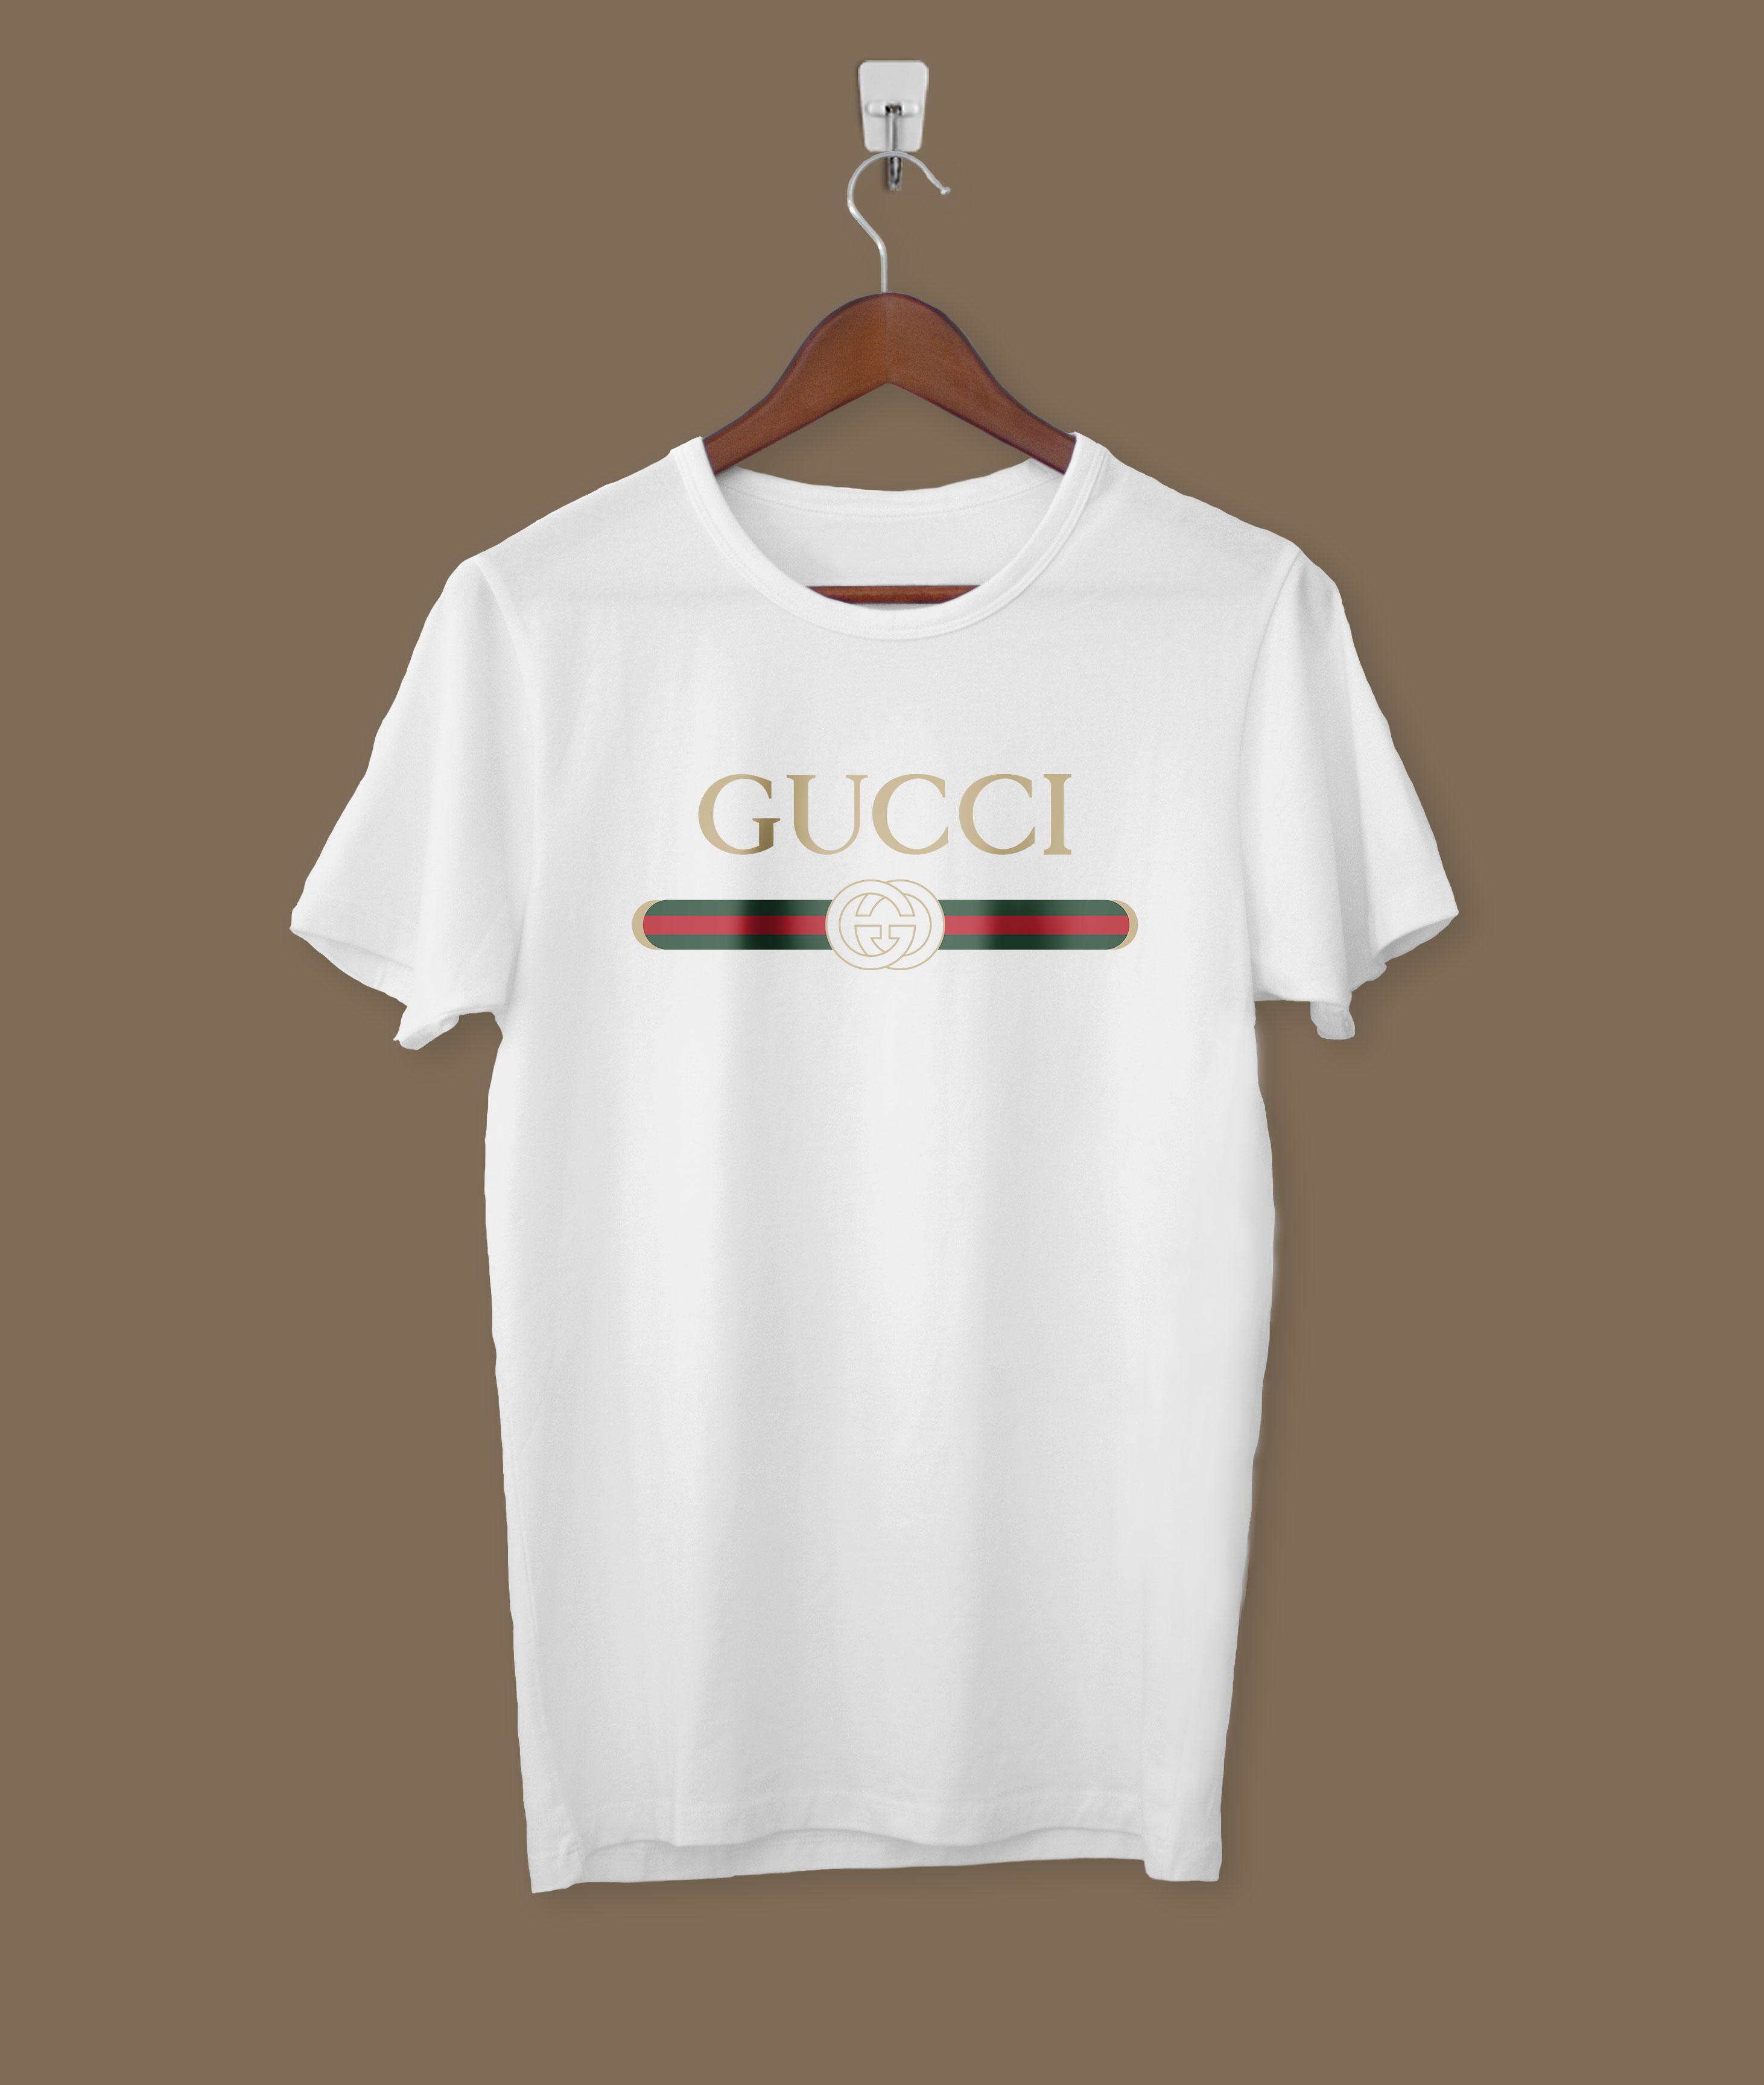 88990a5ffe Gucci Logo Shirt Men Women Tshirt Unisex Tee Black White S-3XL from ErLov